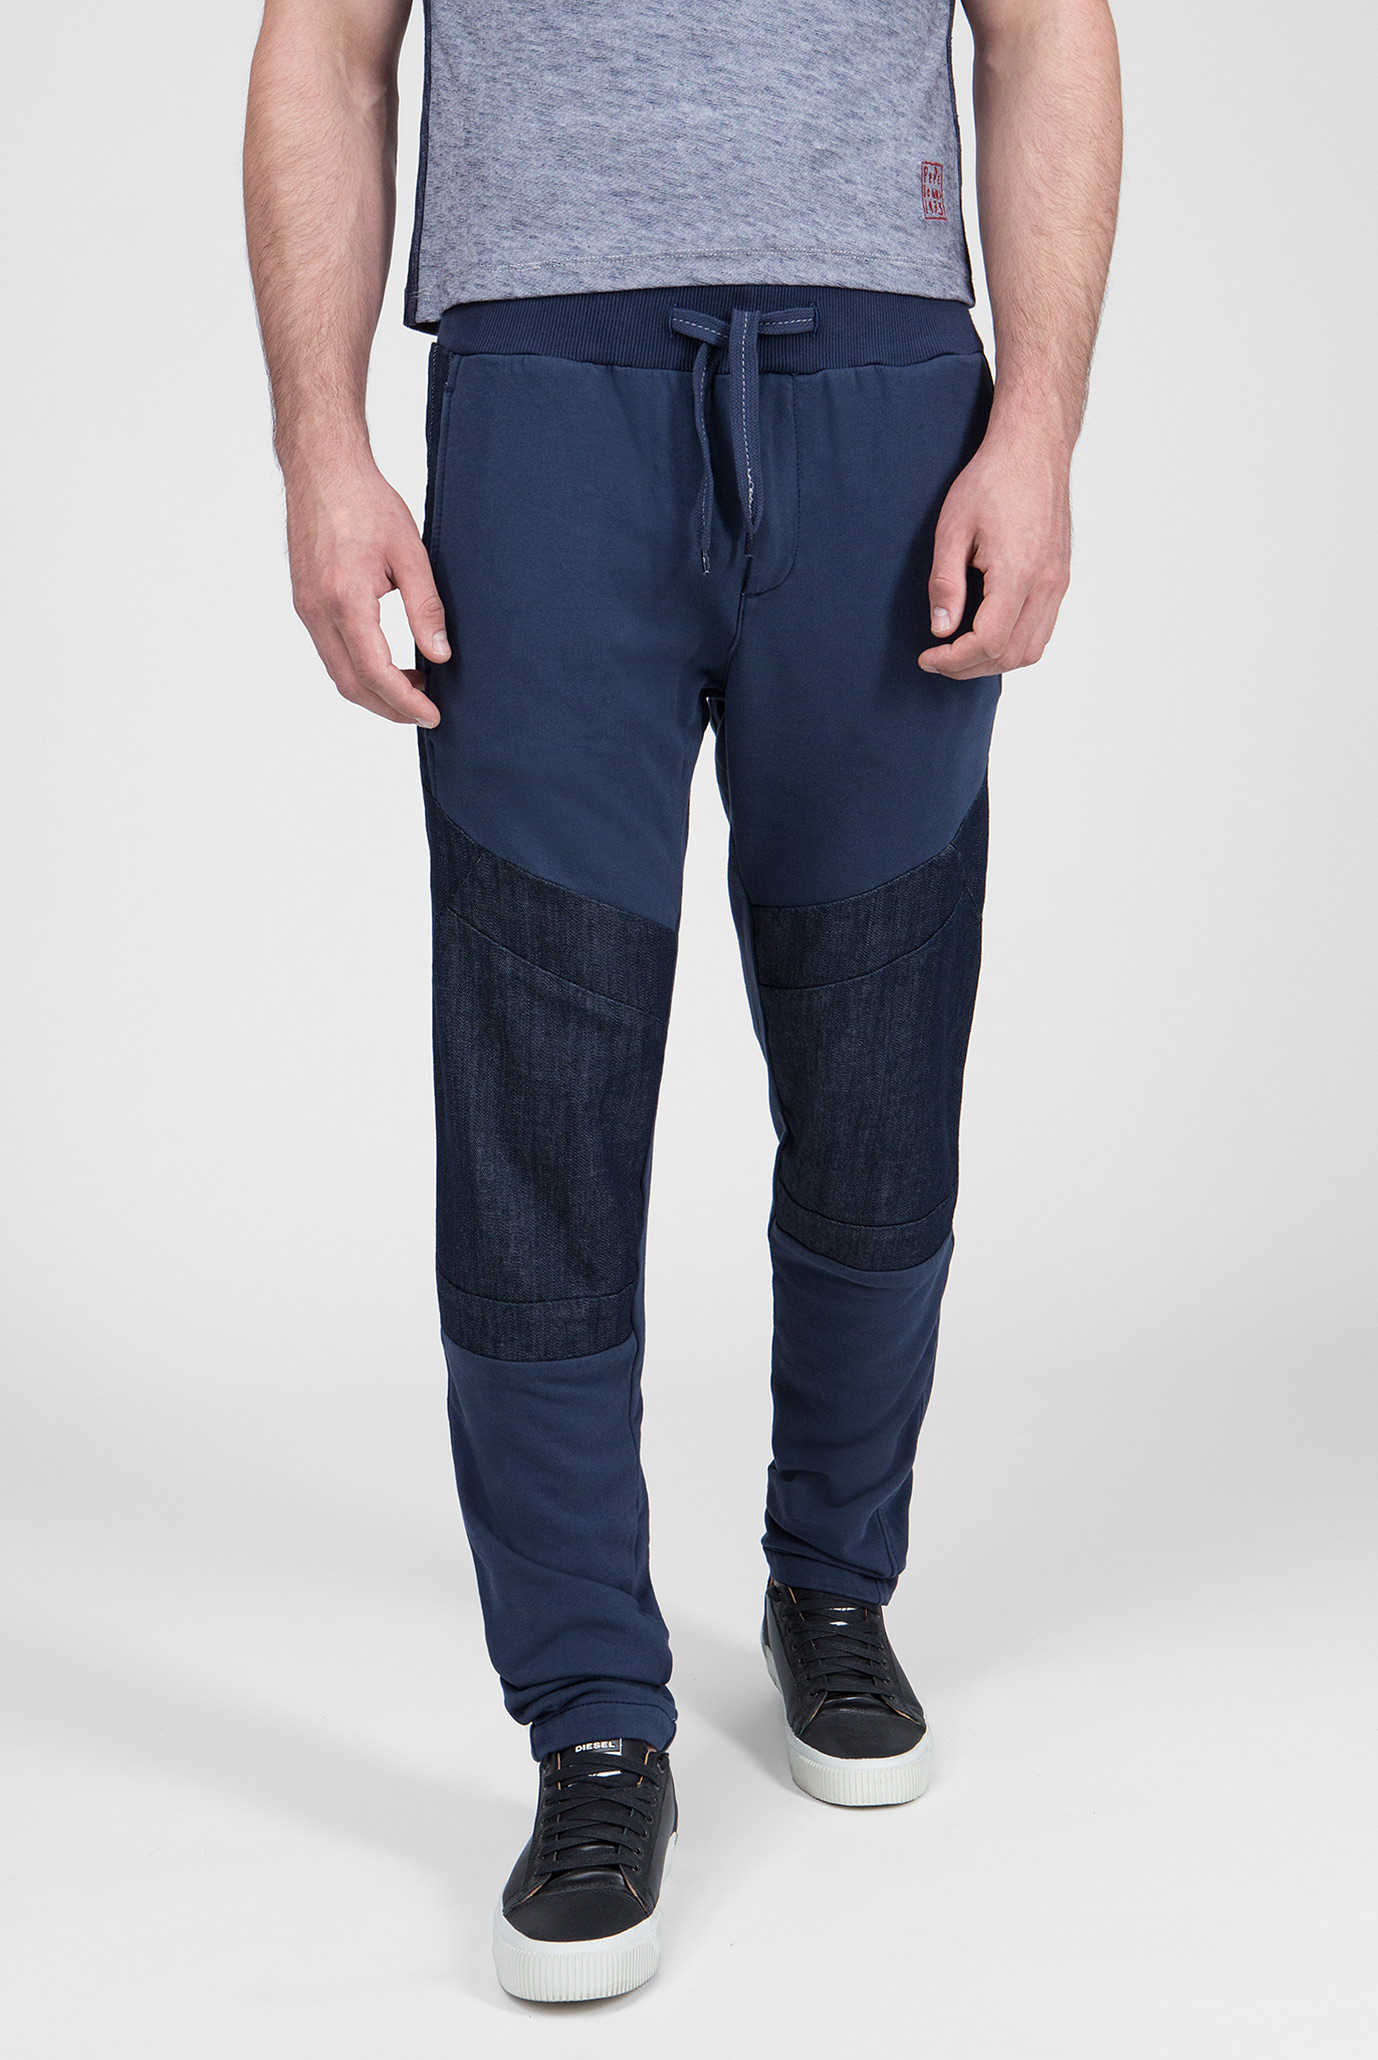 Купить Мужские синие брюки KEYS MIX Pepe Jeans Pepe Jeans PM2042692 – Киев, Украина. Цены в интернет магазине MD Fashion